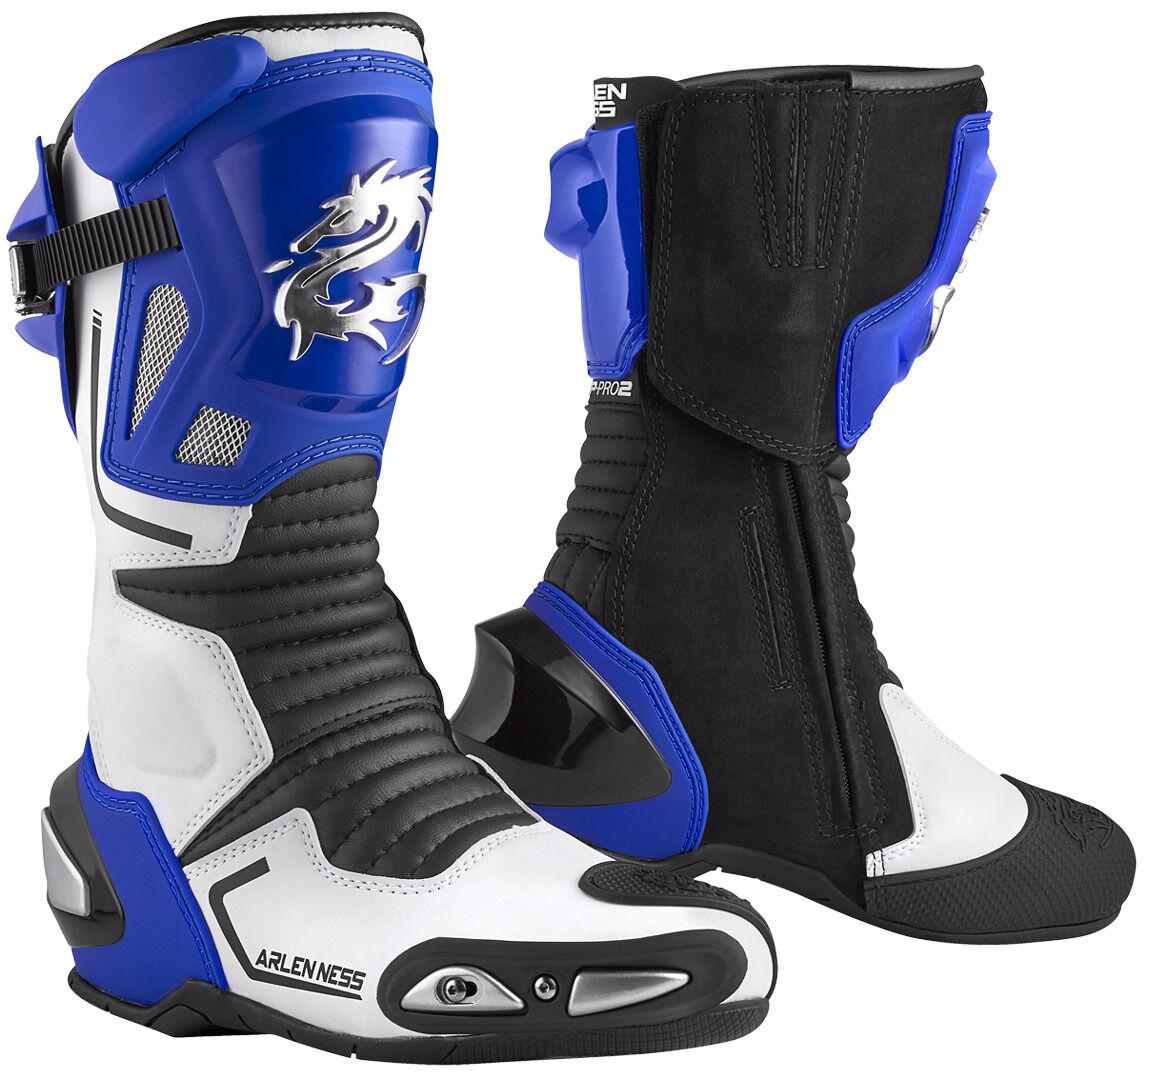 Arlen Ness Sugello Bottes de moto Noir Blanc Bleu taille : 41